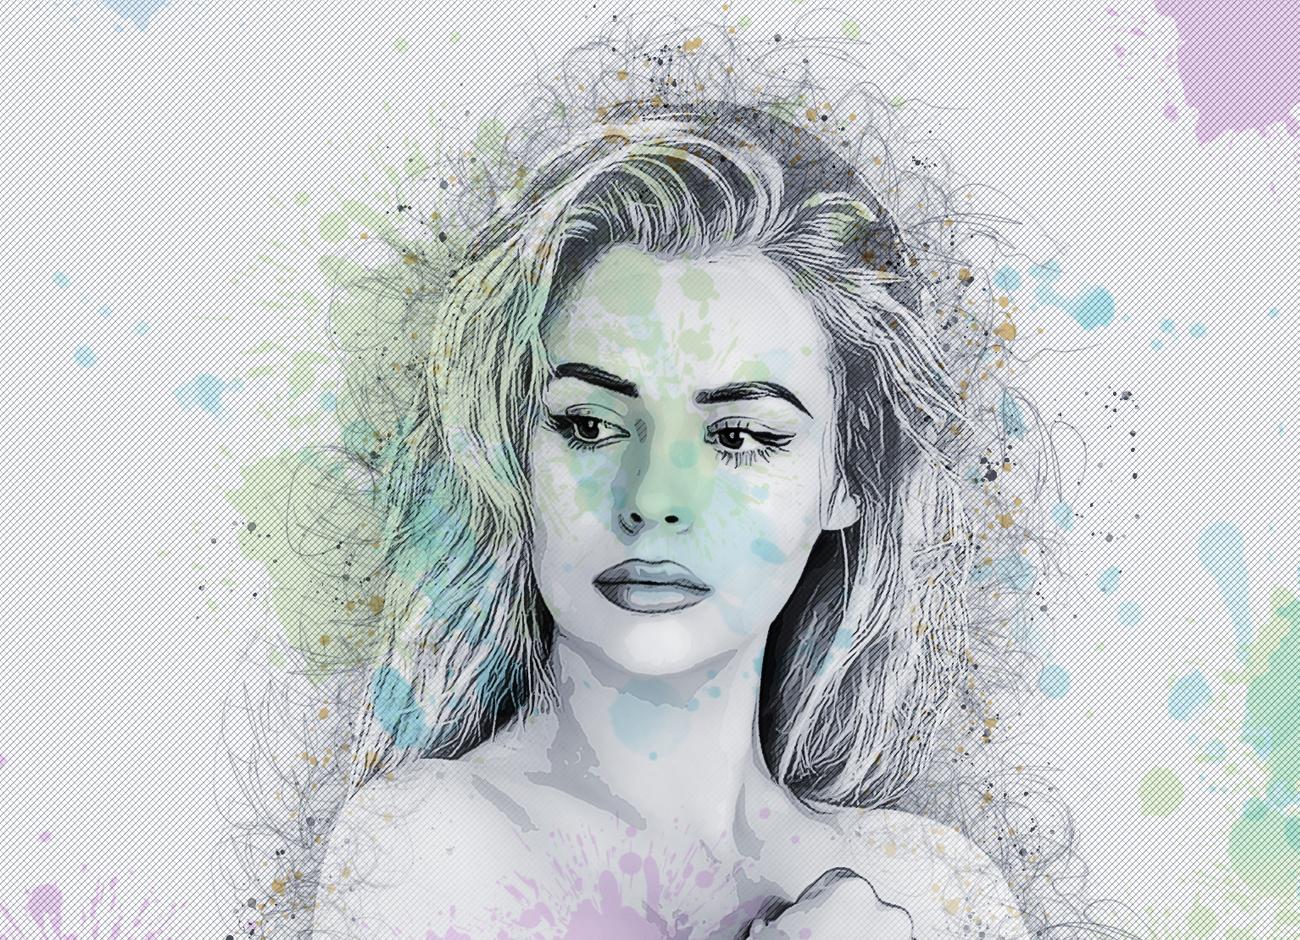 抽象铅笔素描效果照片处理特效PS动作模板 Abstract Sketch Photoshop Action插图7